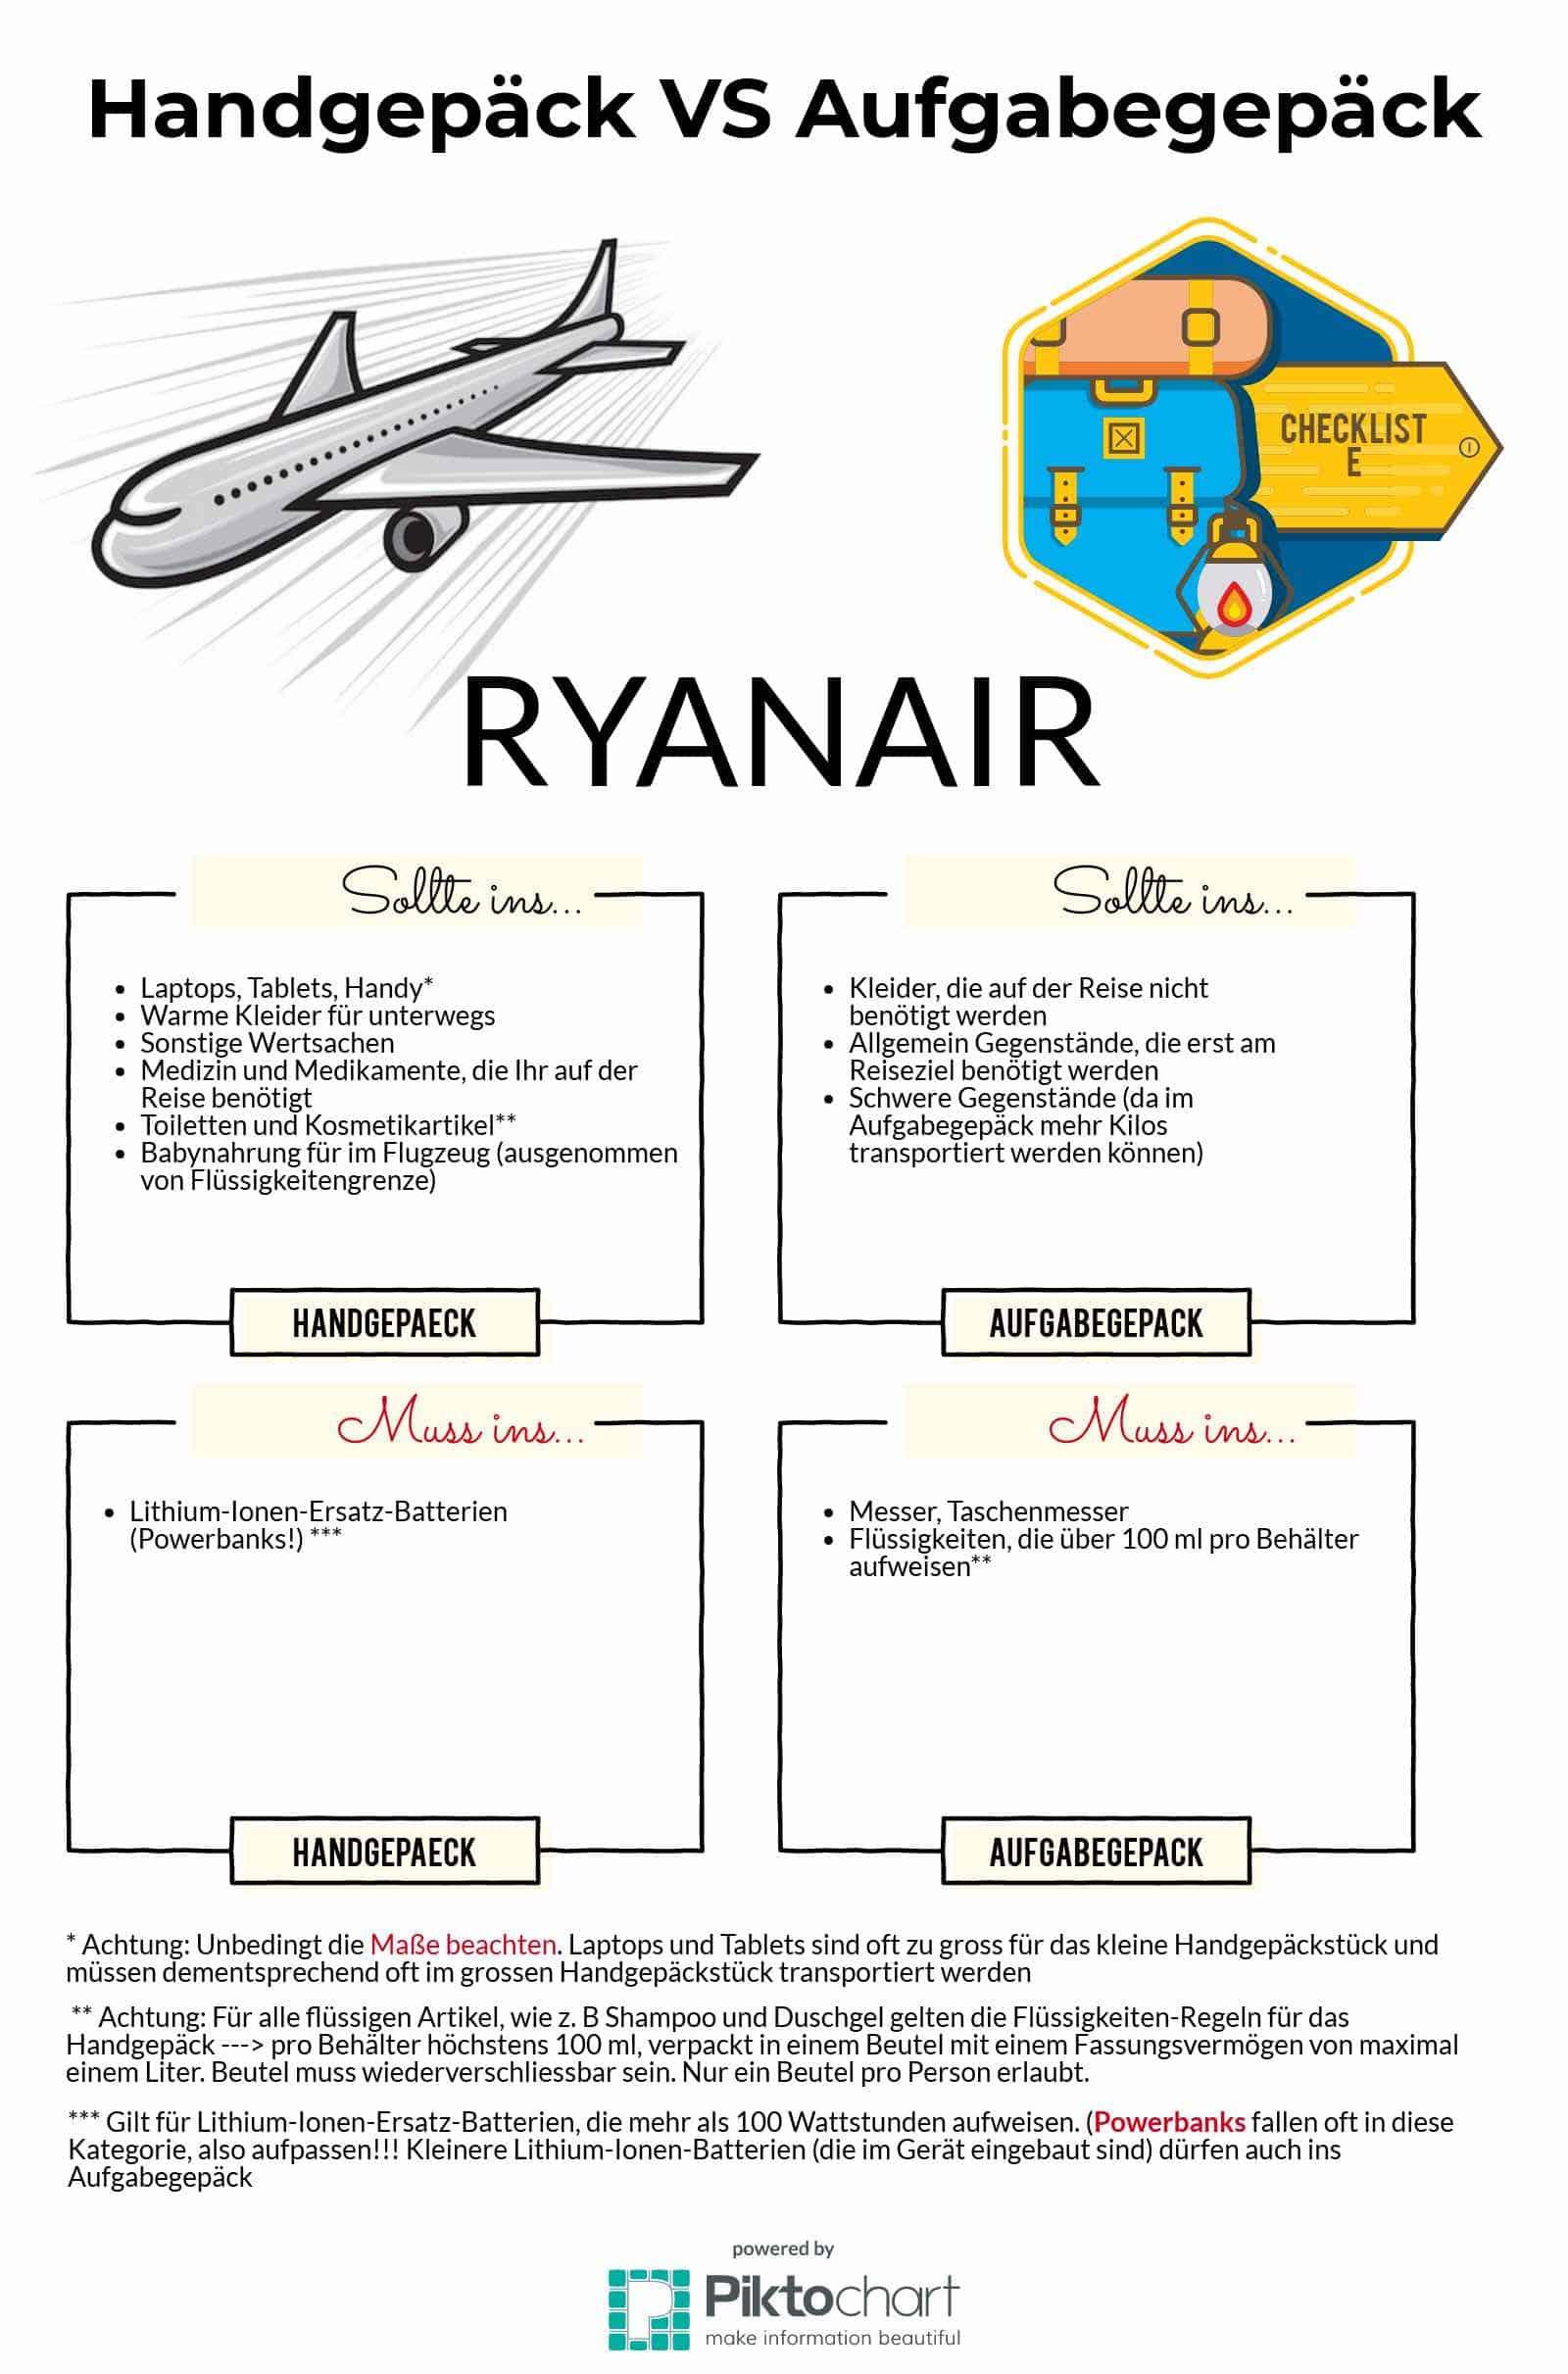 Ryanair gepäck maße 2019